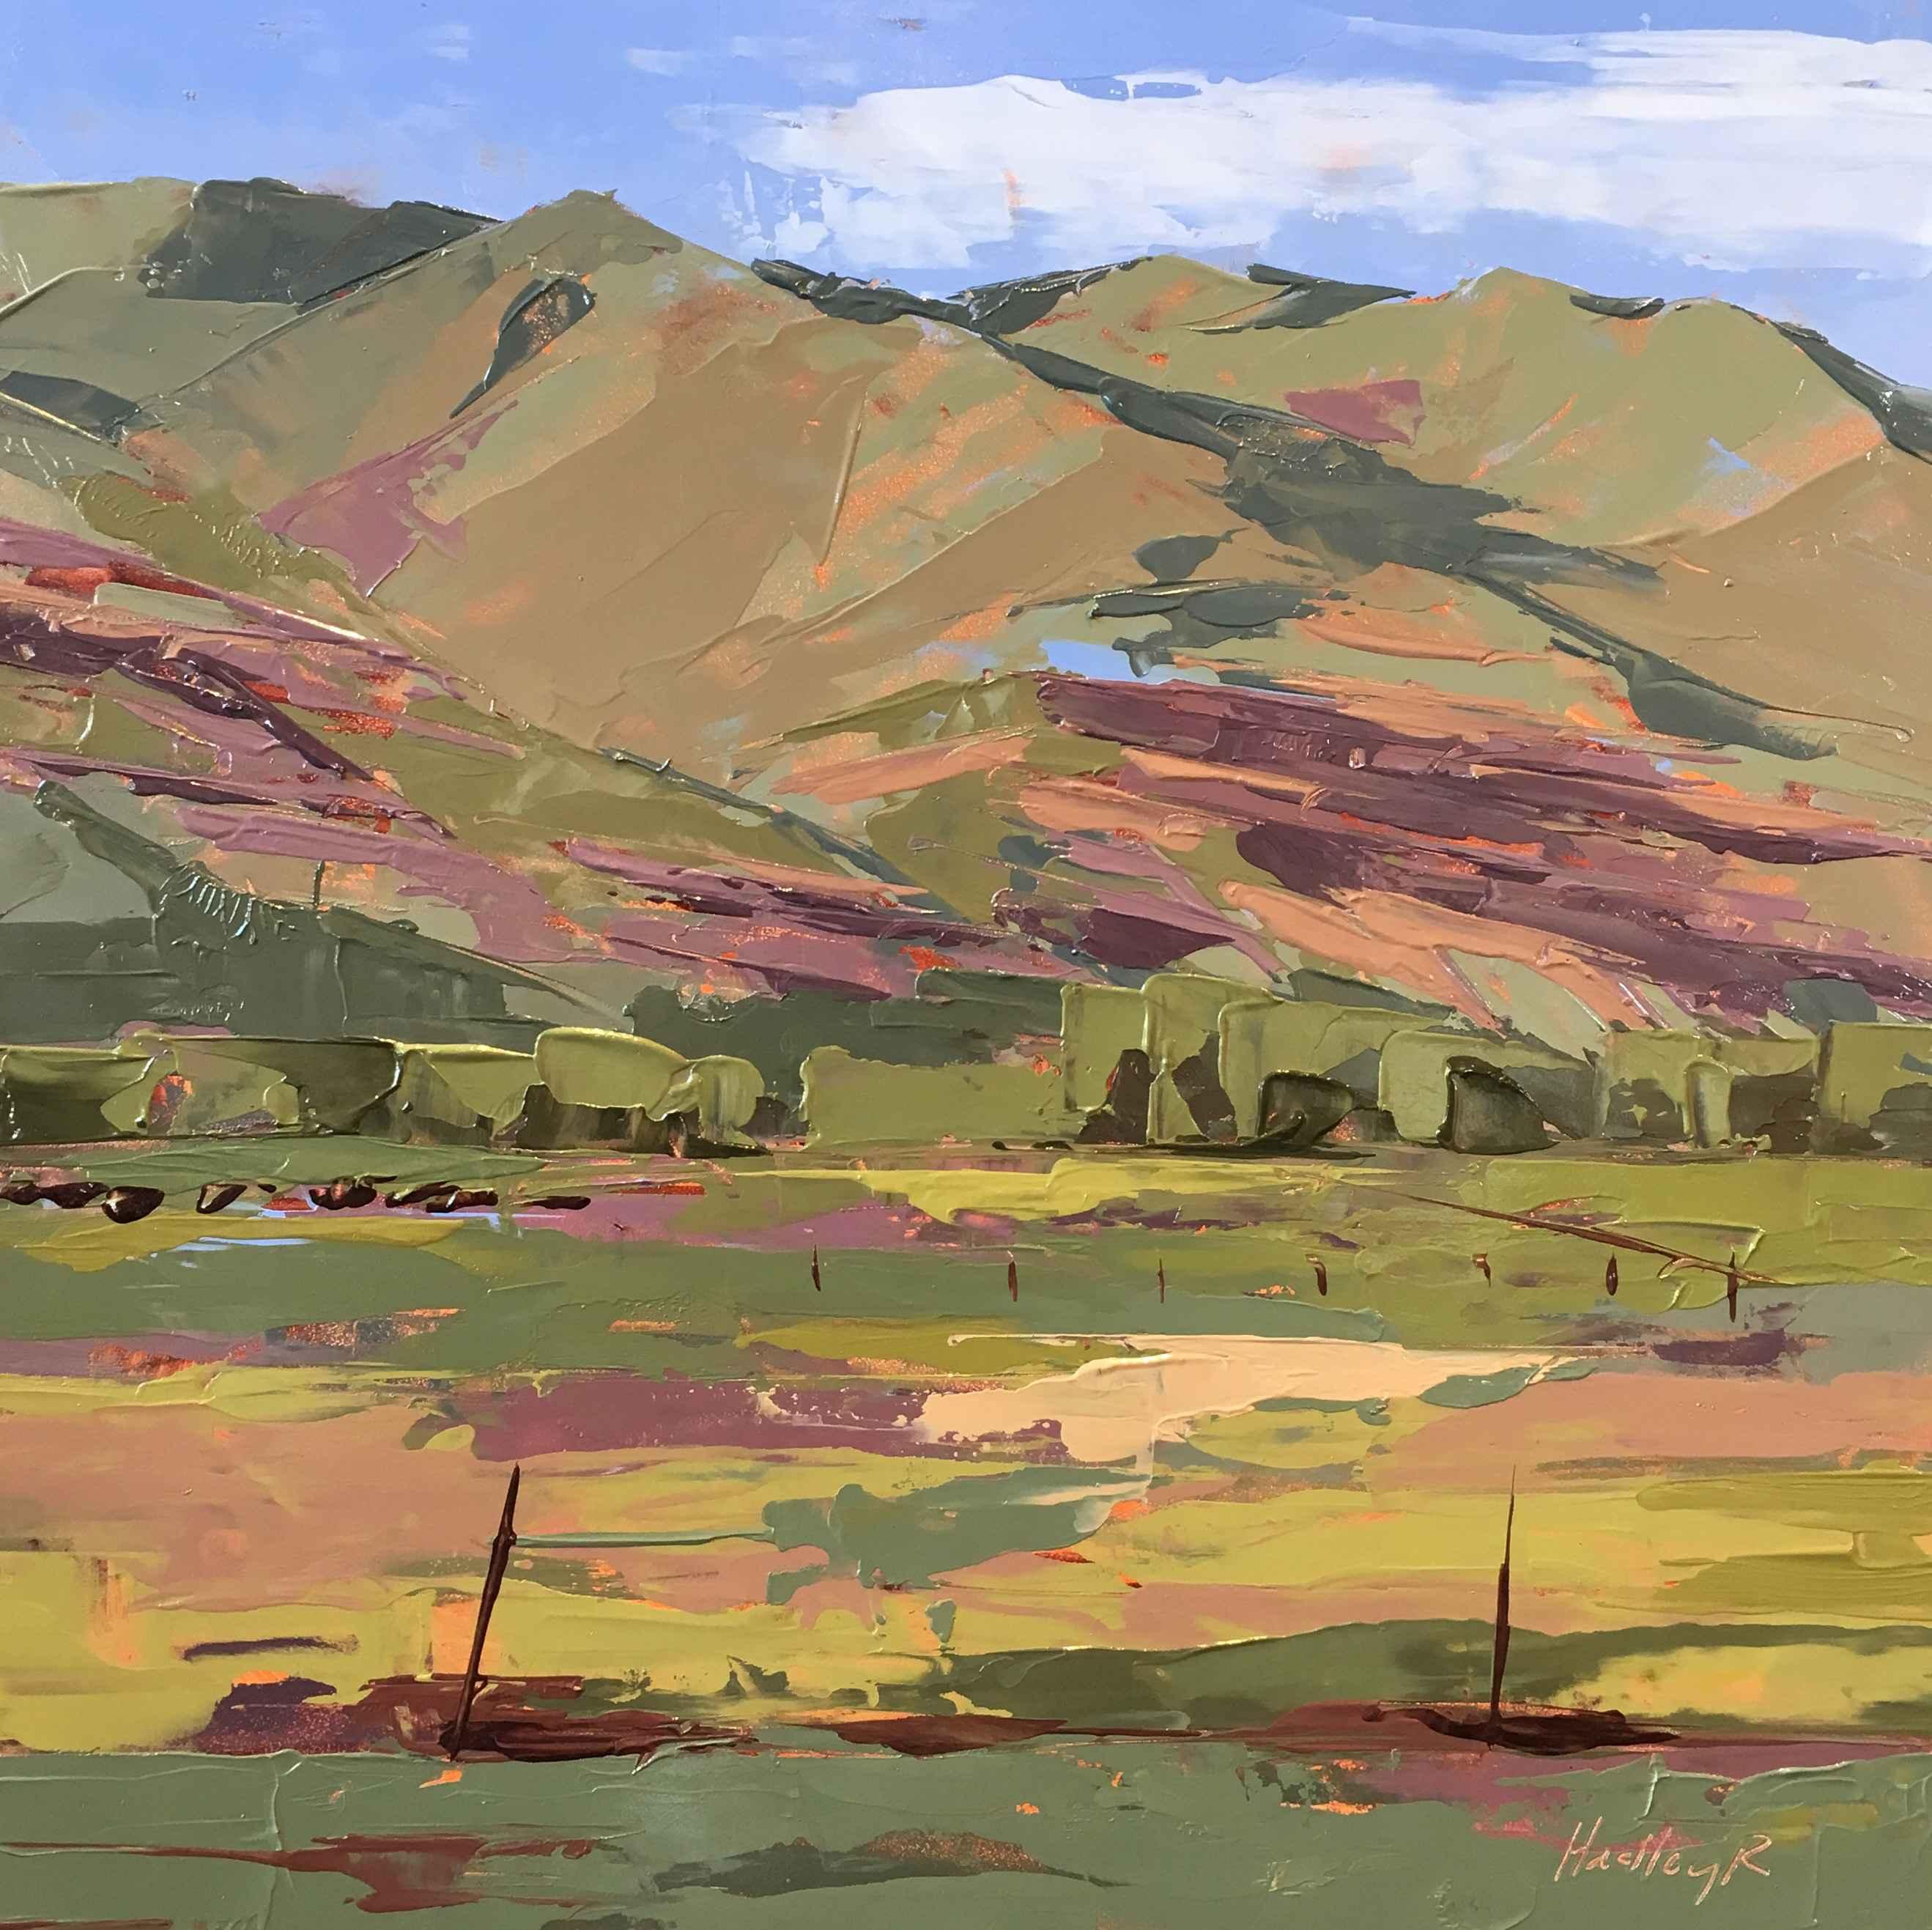 San Juans at Hermosa by  Hadley Rampton - Masterpiece Online